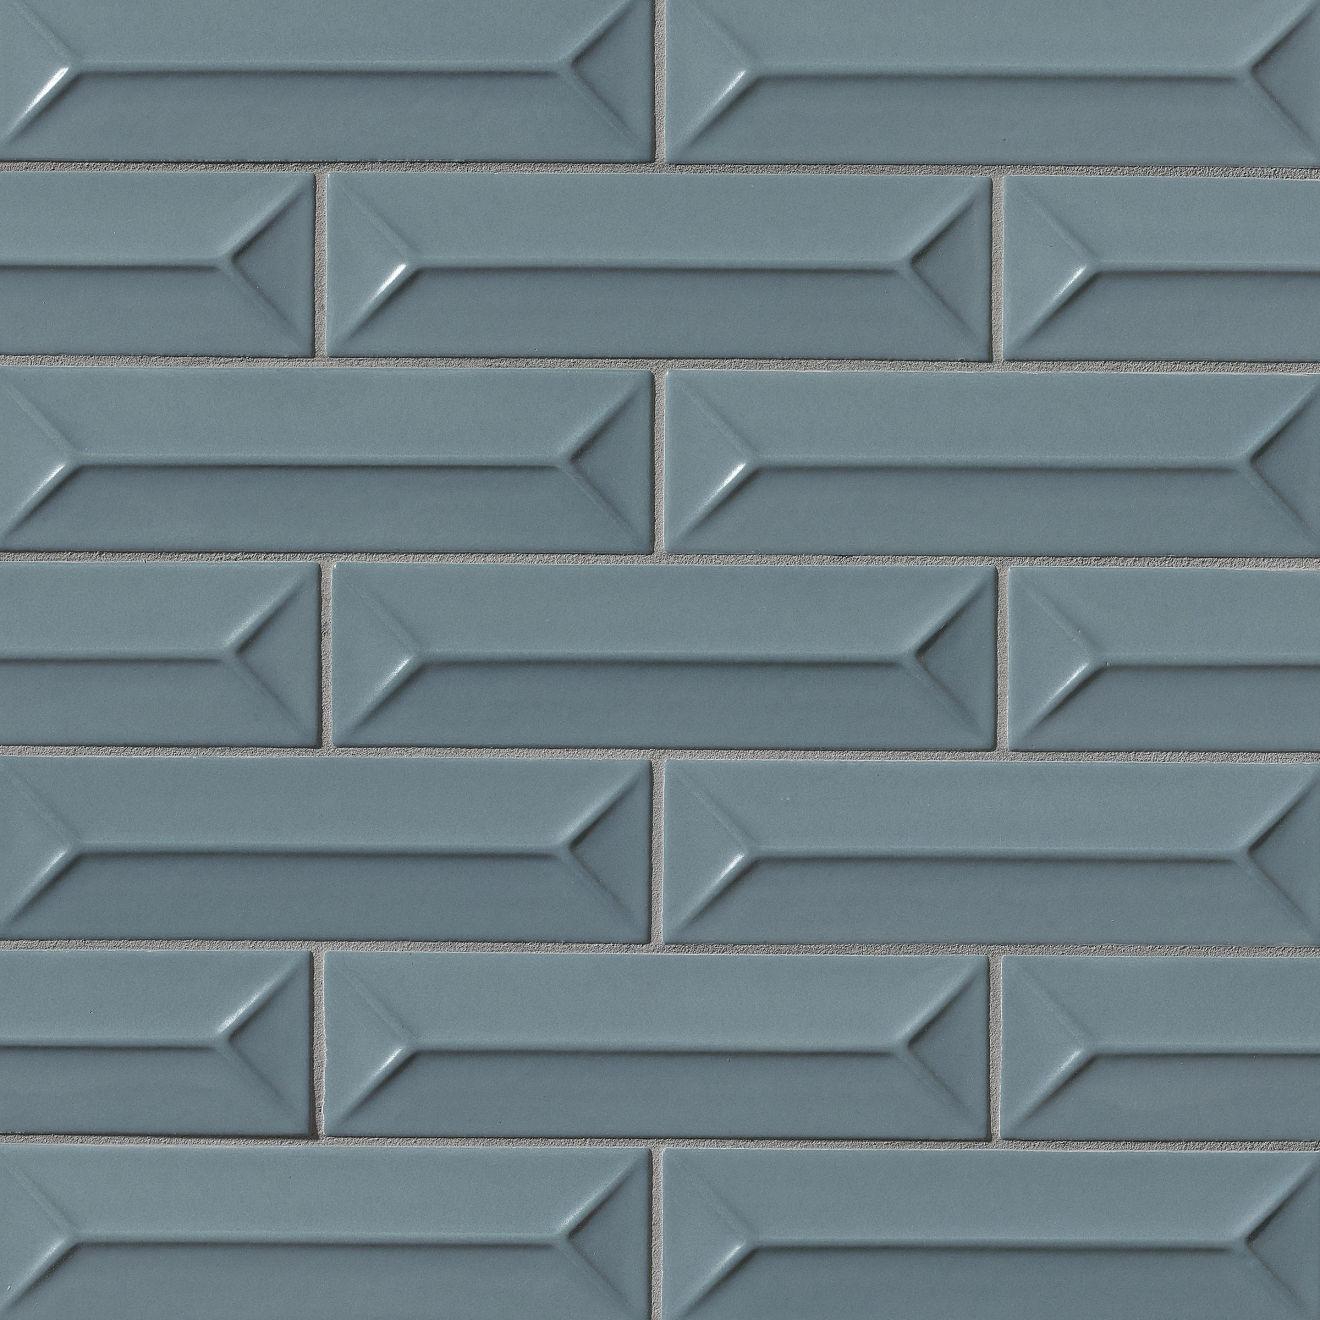 "Costa Allegra 2.5"" x 9"" Decorative Tile in Adriatic"